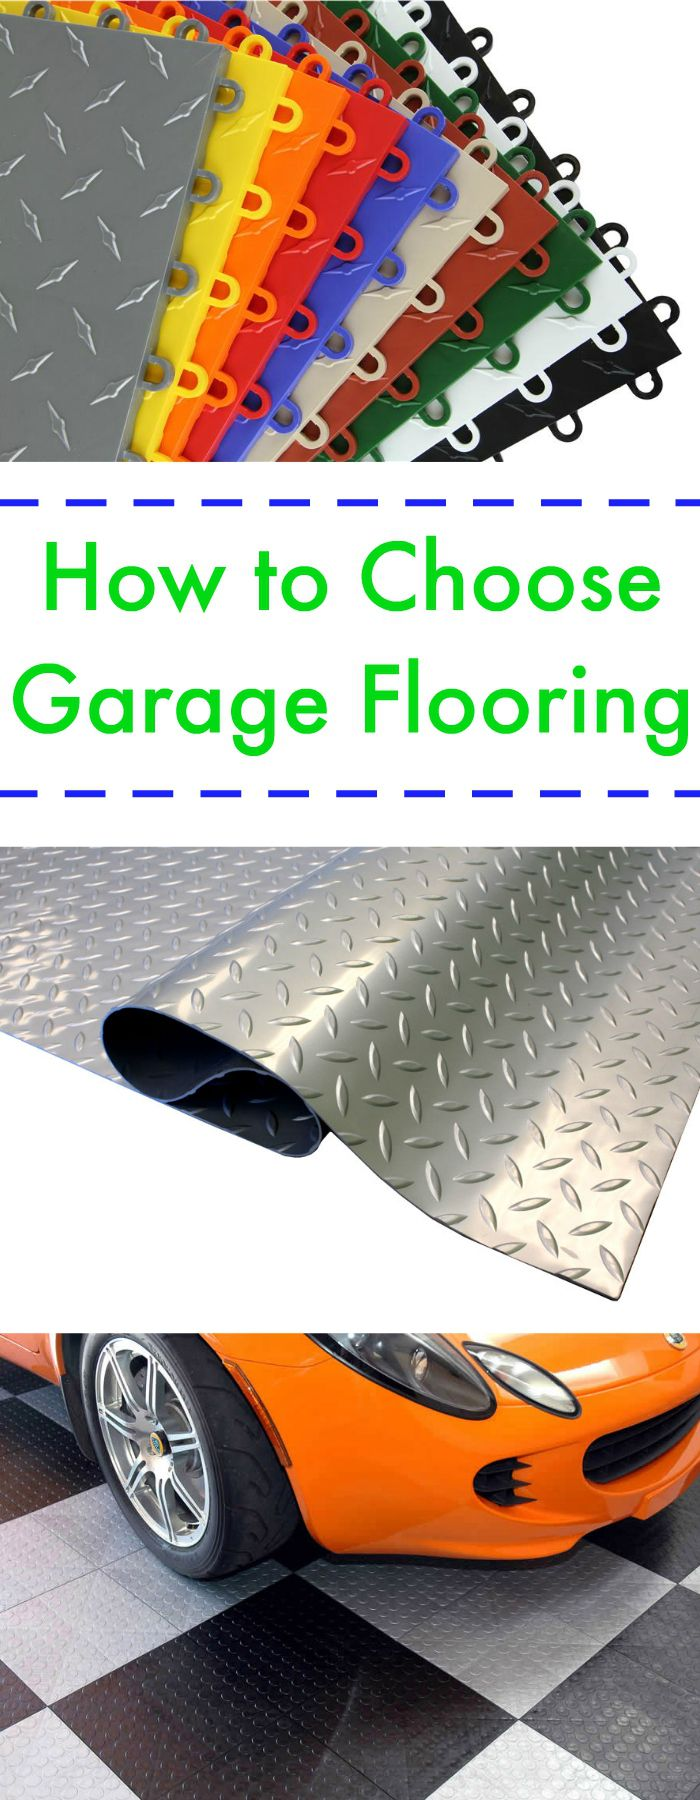 best 25 garage flooring ideas on pinterest painted garage floors garage floor paint and. Black Bedroom Furniture Sets. Home Design Ideas